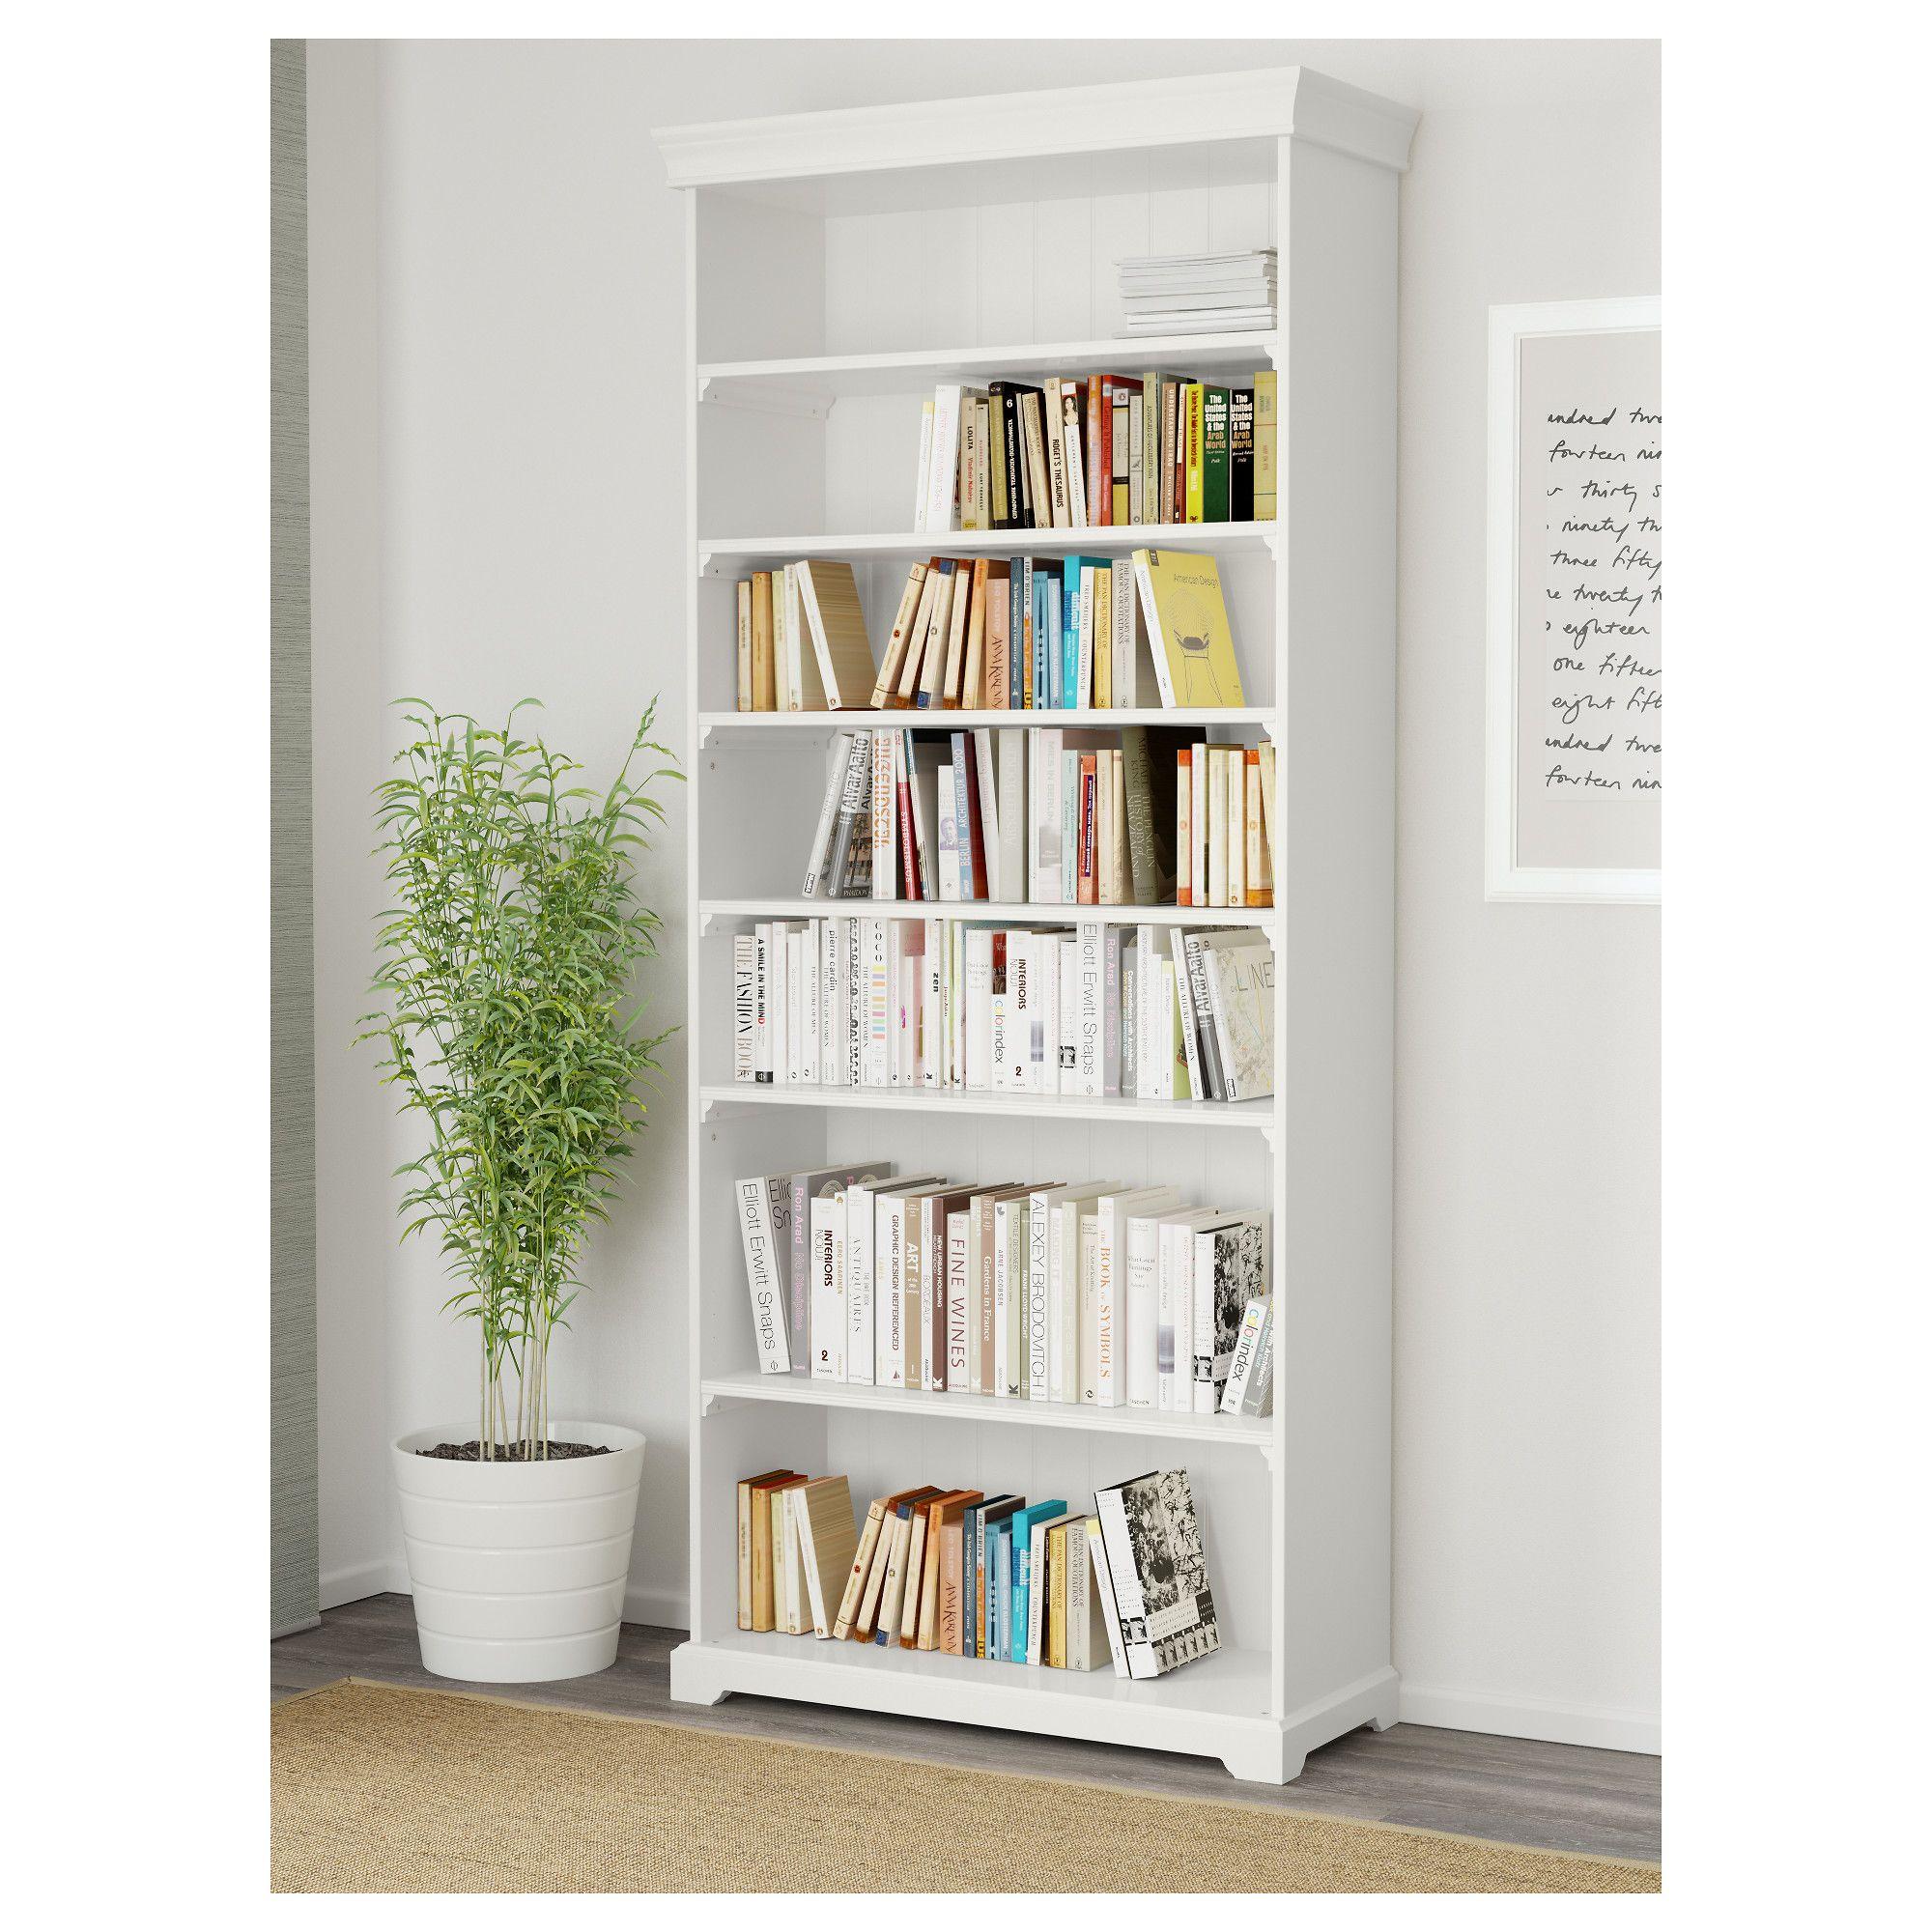 Liatorp Bookcase White 96×214 Cm # Muebles Liatorp Segunda Mano